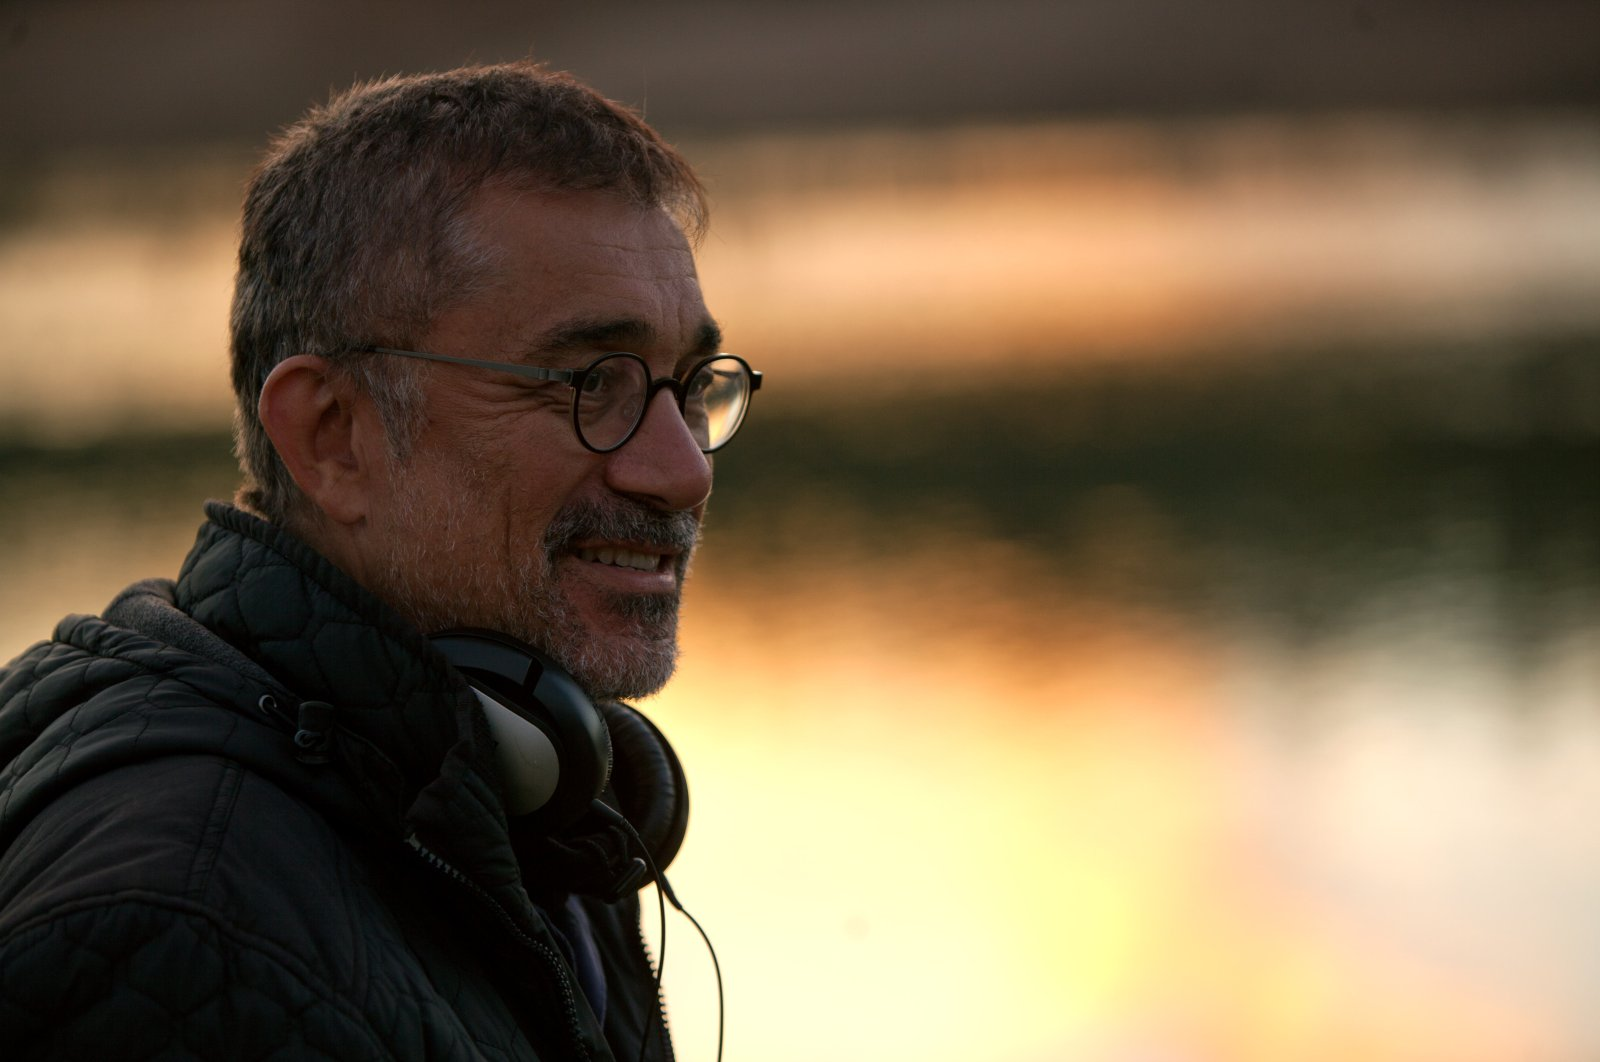 Nuri Bilge Ceylan will preside over the seven-member jury board of the International Migration Film Festival.